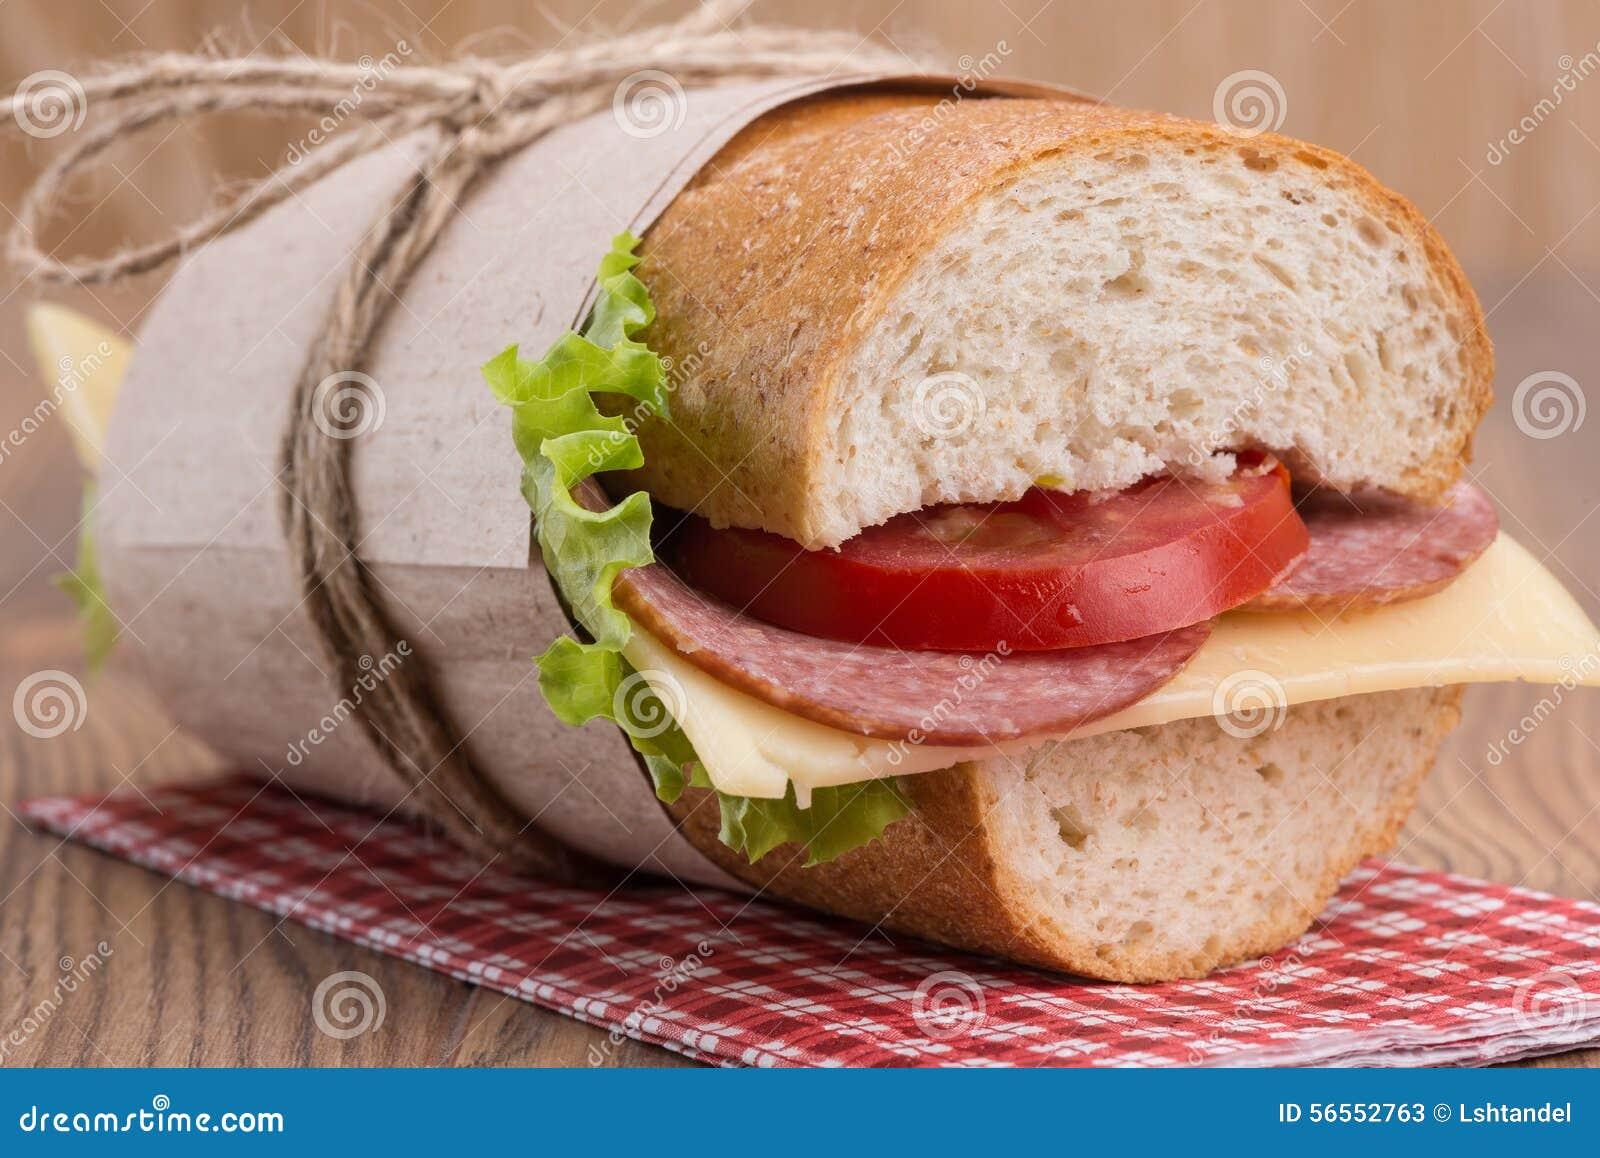 Download Σάντουιτς με το τυρί και το λουκάνικο Στοκ Εικόνα - εικόνα από μαρούλι, lunch: 56552763